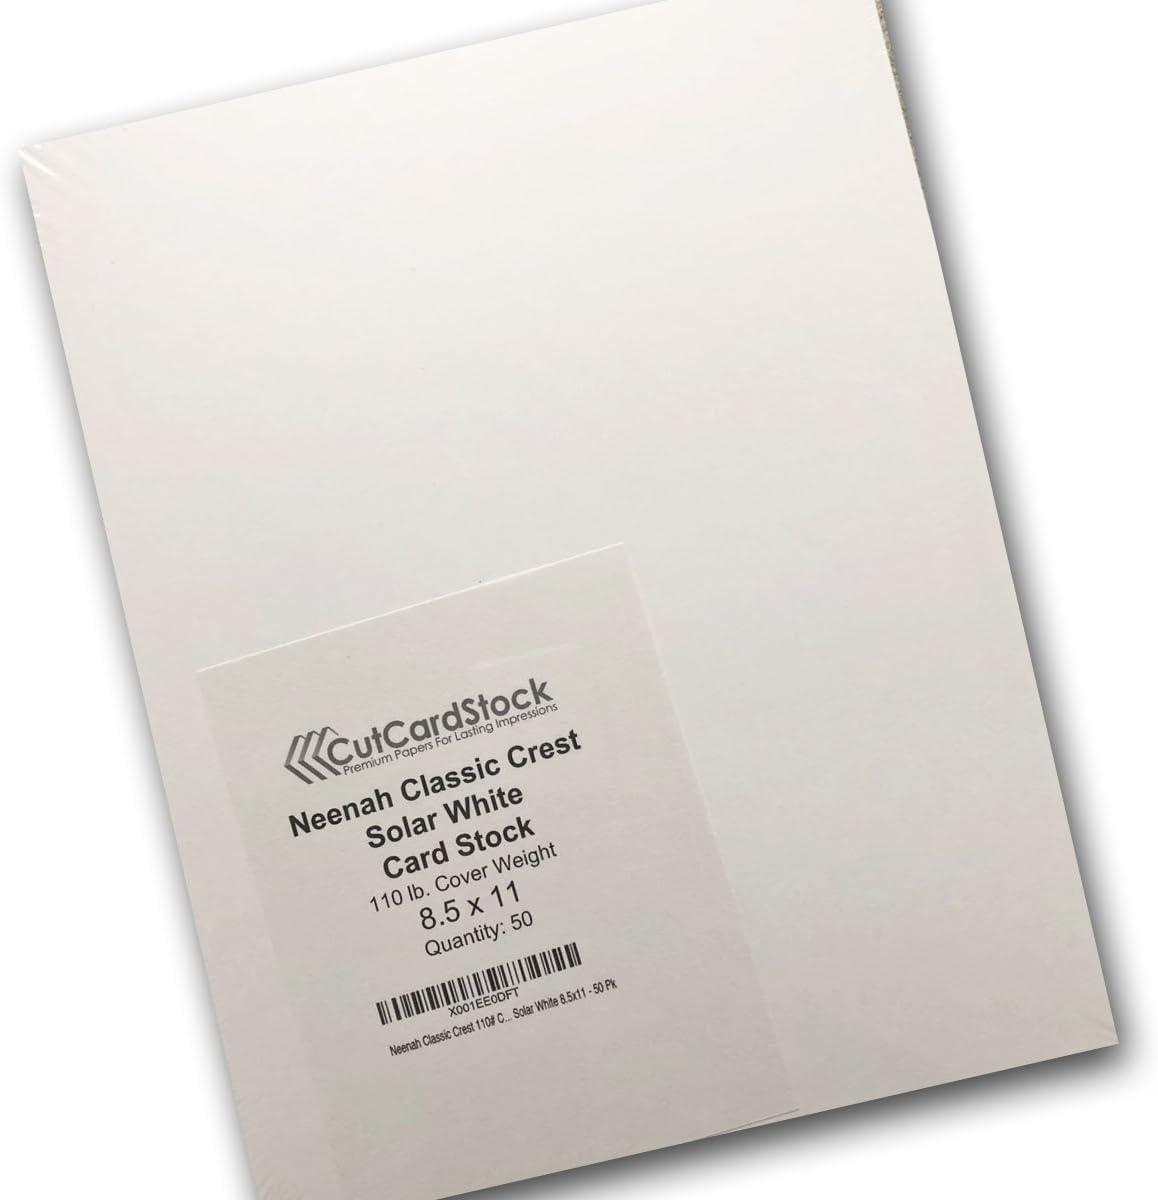 Neenah Classic Crest 110# Cover Solar White 8.5x11 - 50 Pk